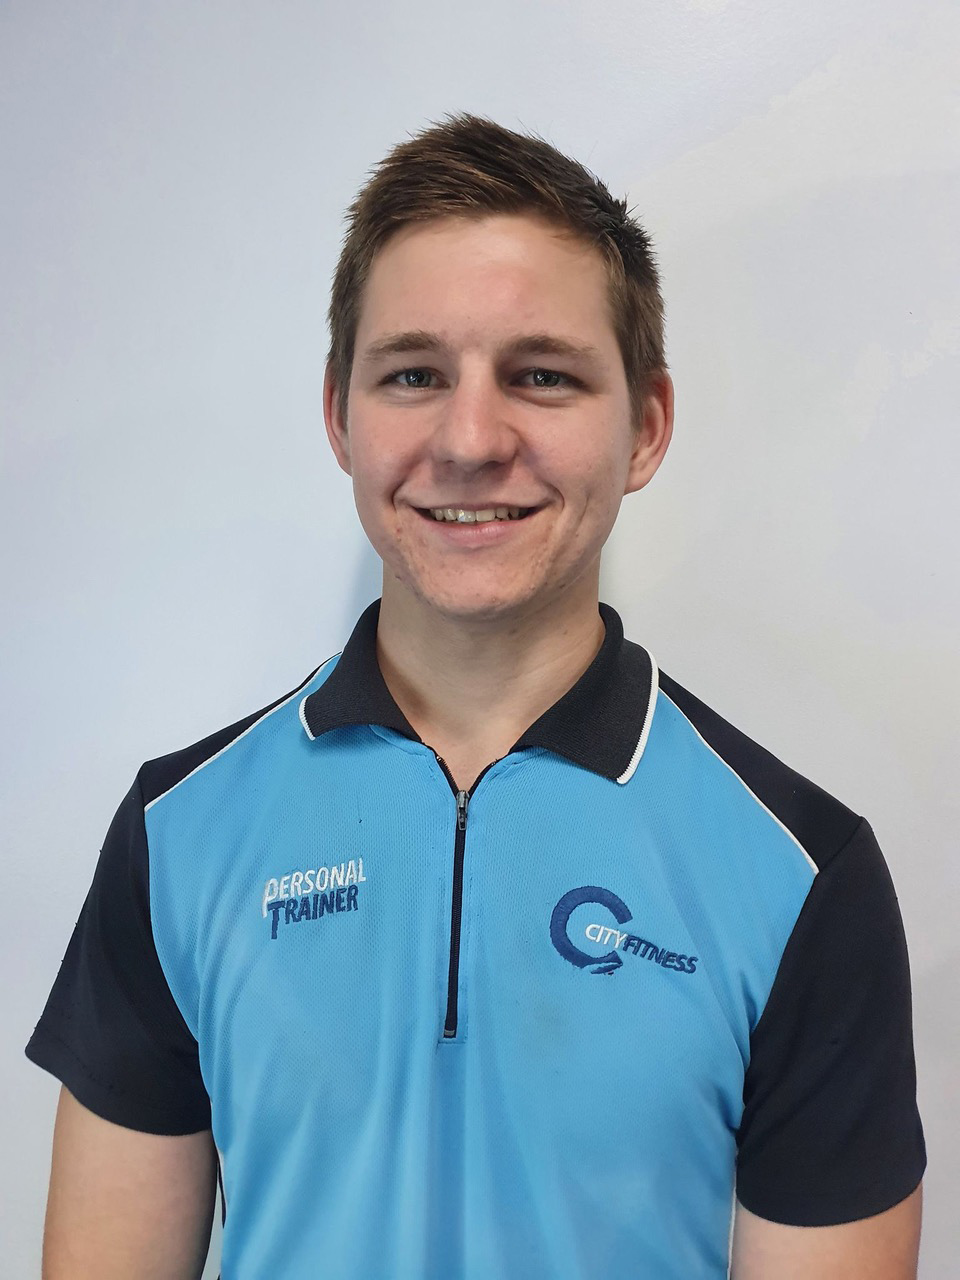 Selby Andersen City Fitness Mackay Trainer